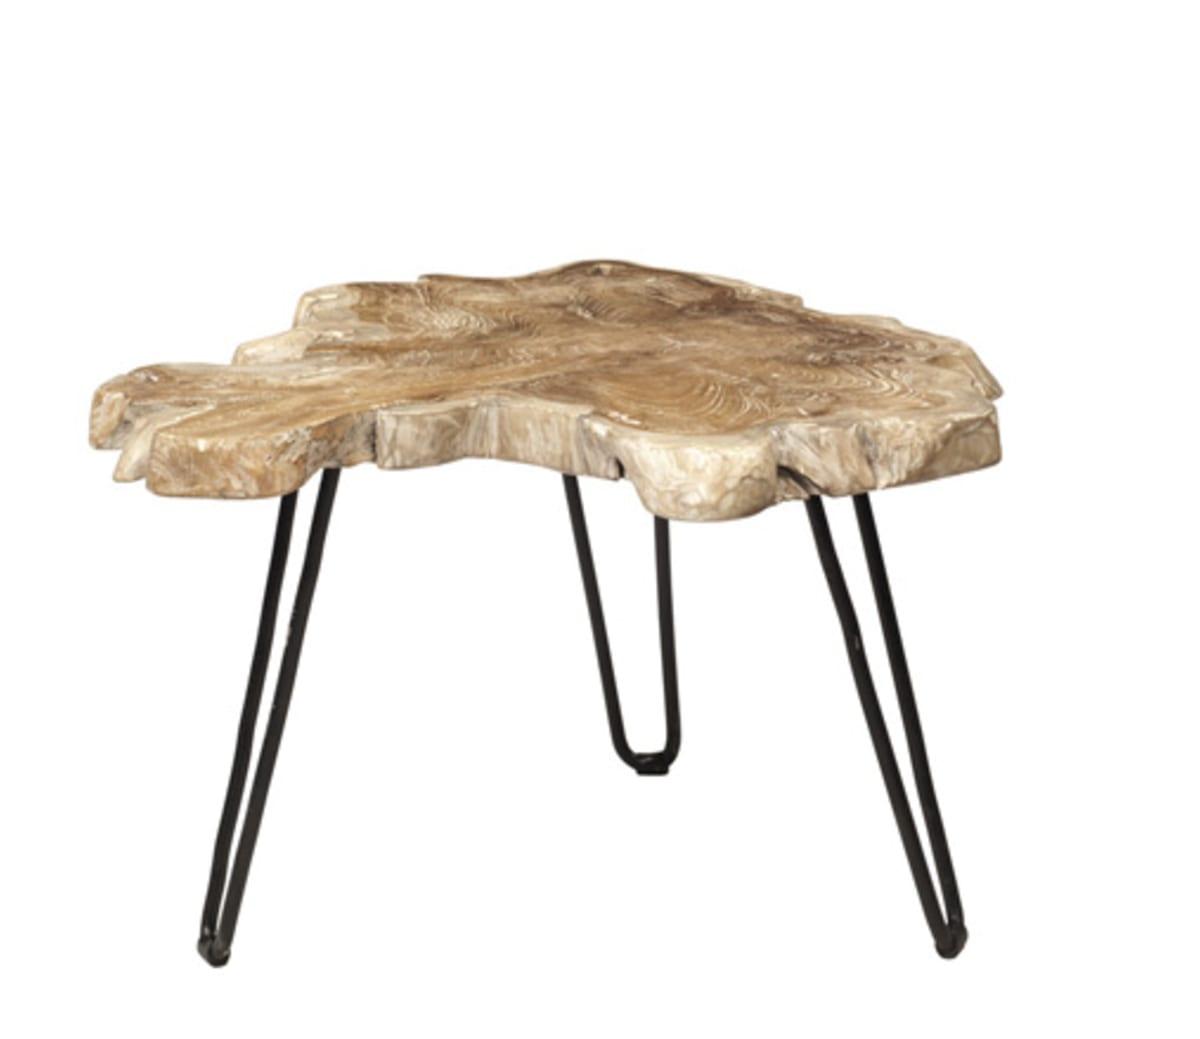 10 places to buy affordable furniture complex. Black Bedroom Furniture Sets. Home Design Ideas